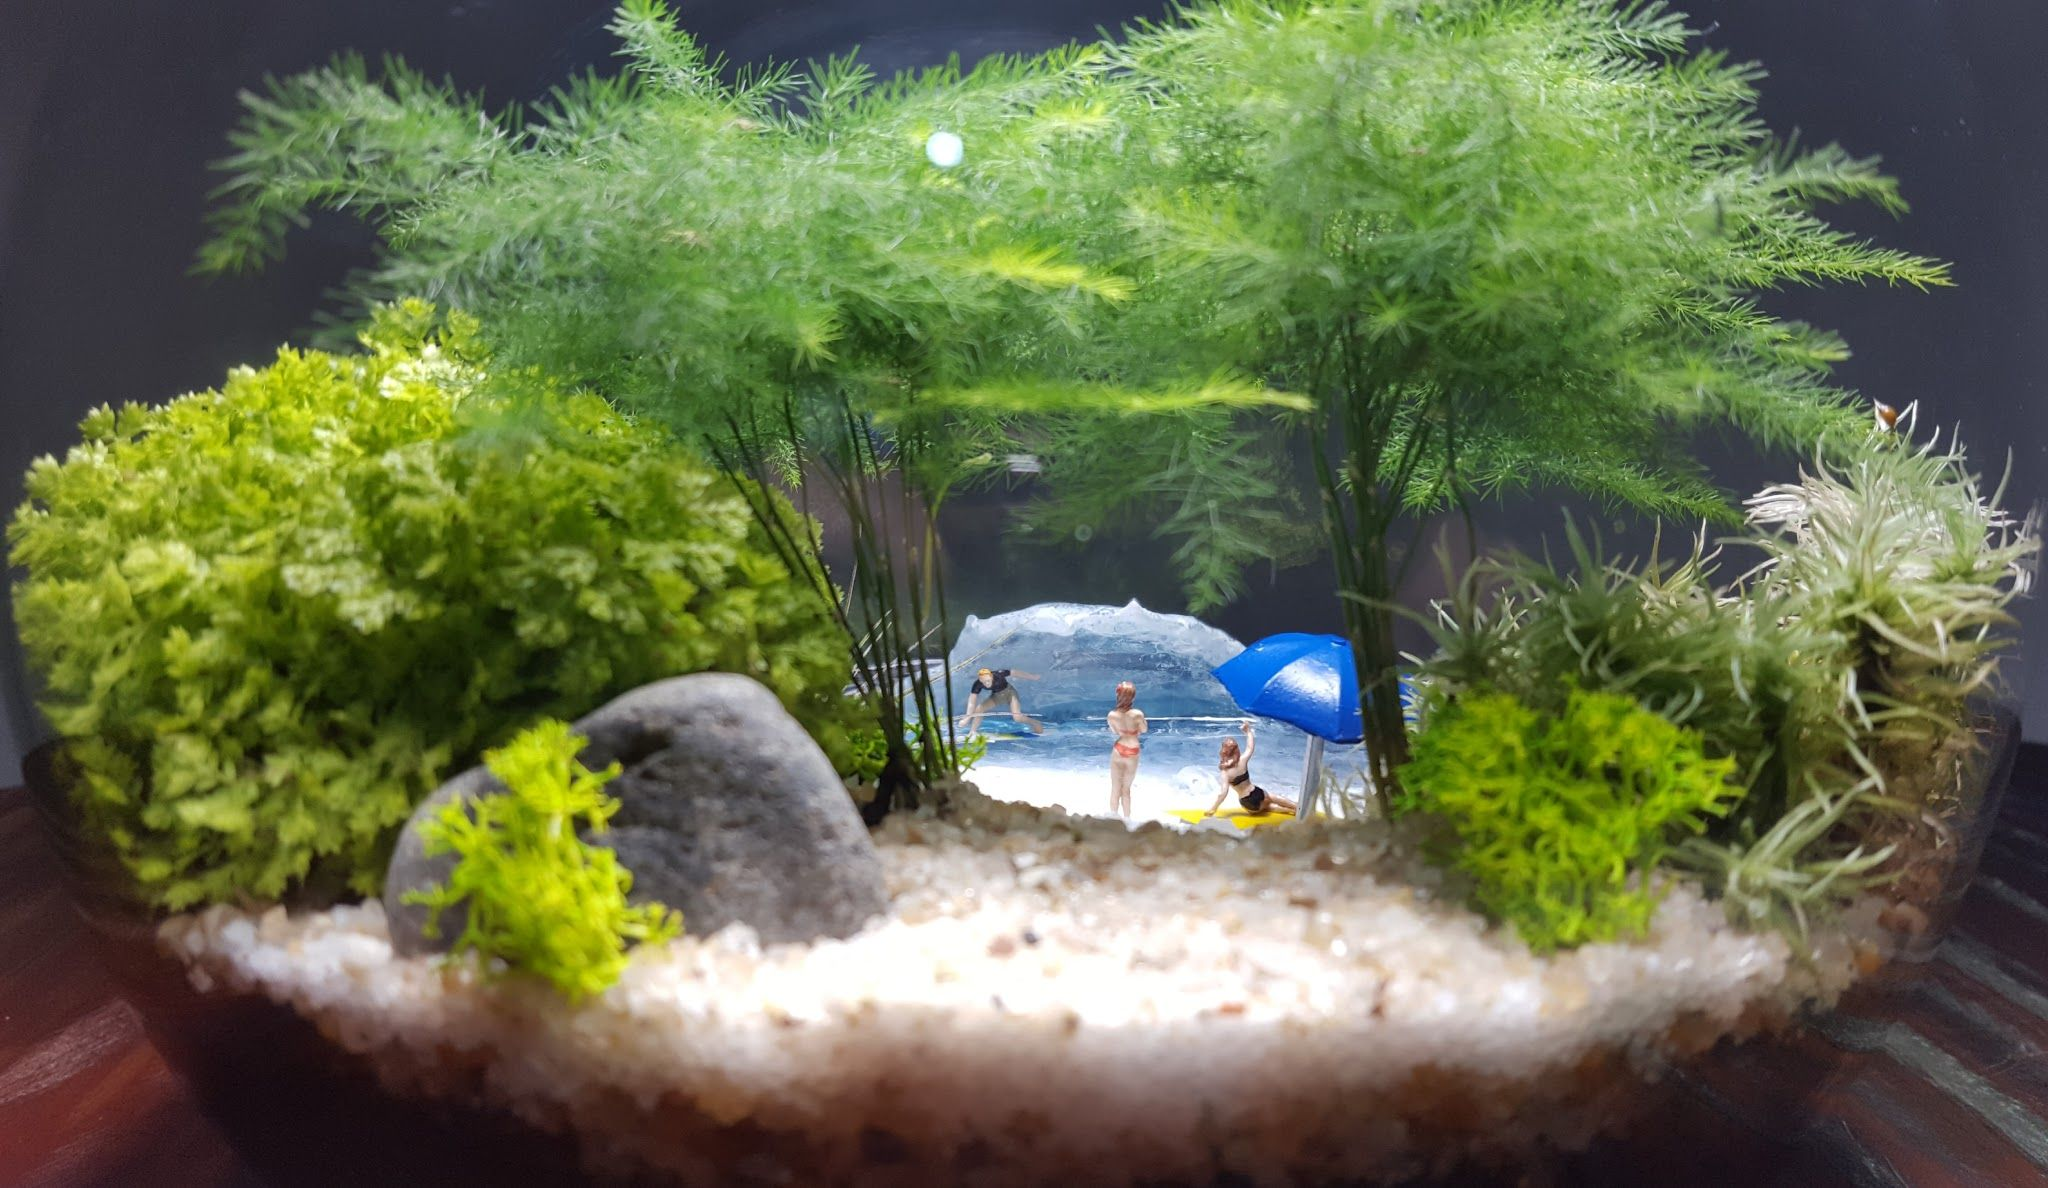 Marimo Stone Moss Miniature Dollhouse Garden Craft Fairy Bonsai Plant Decor+q